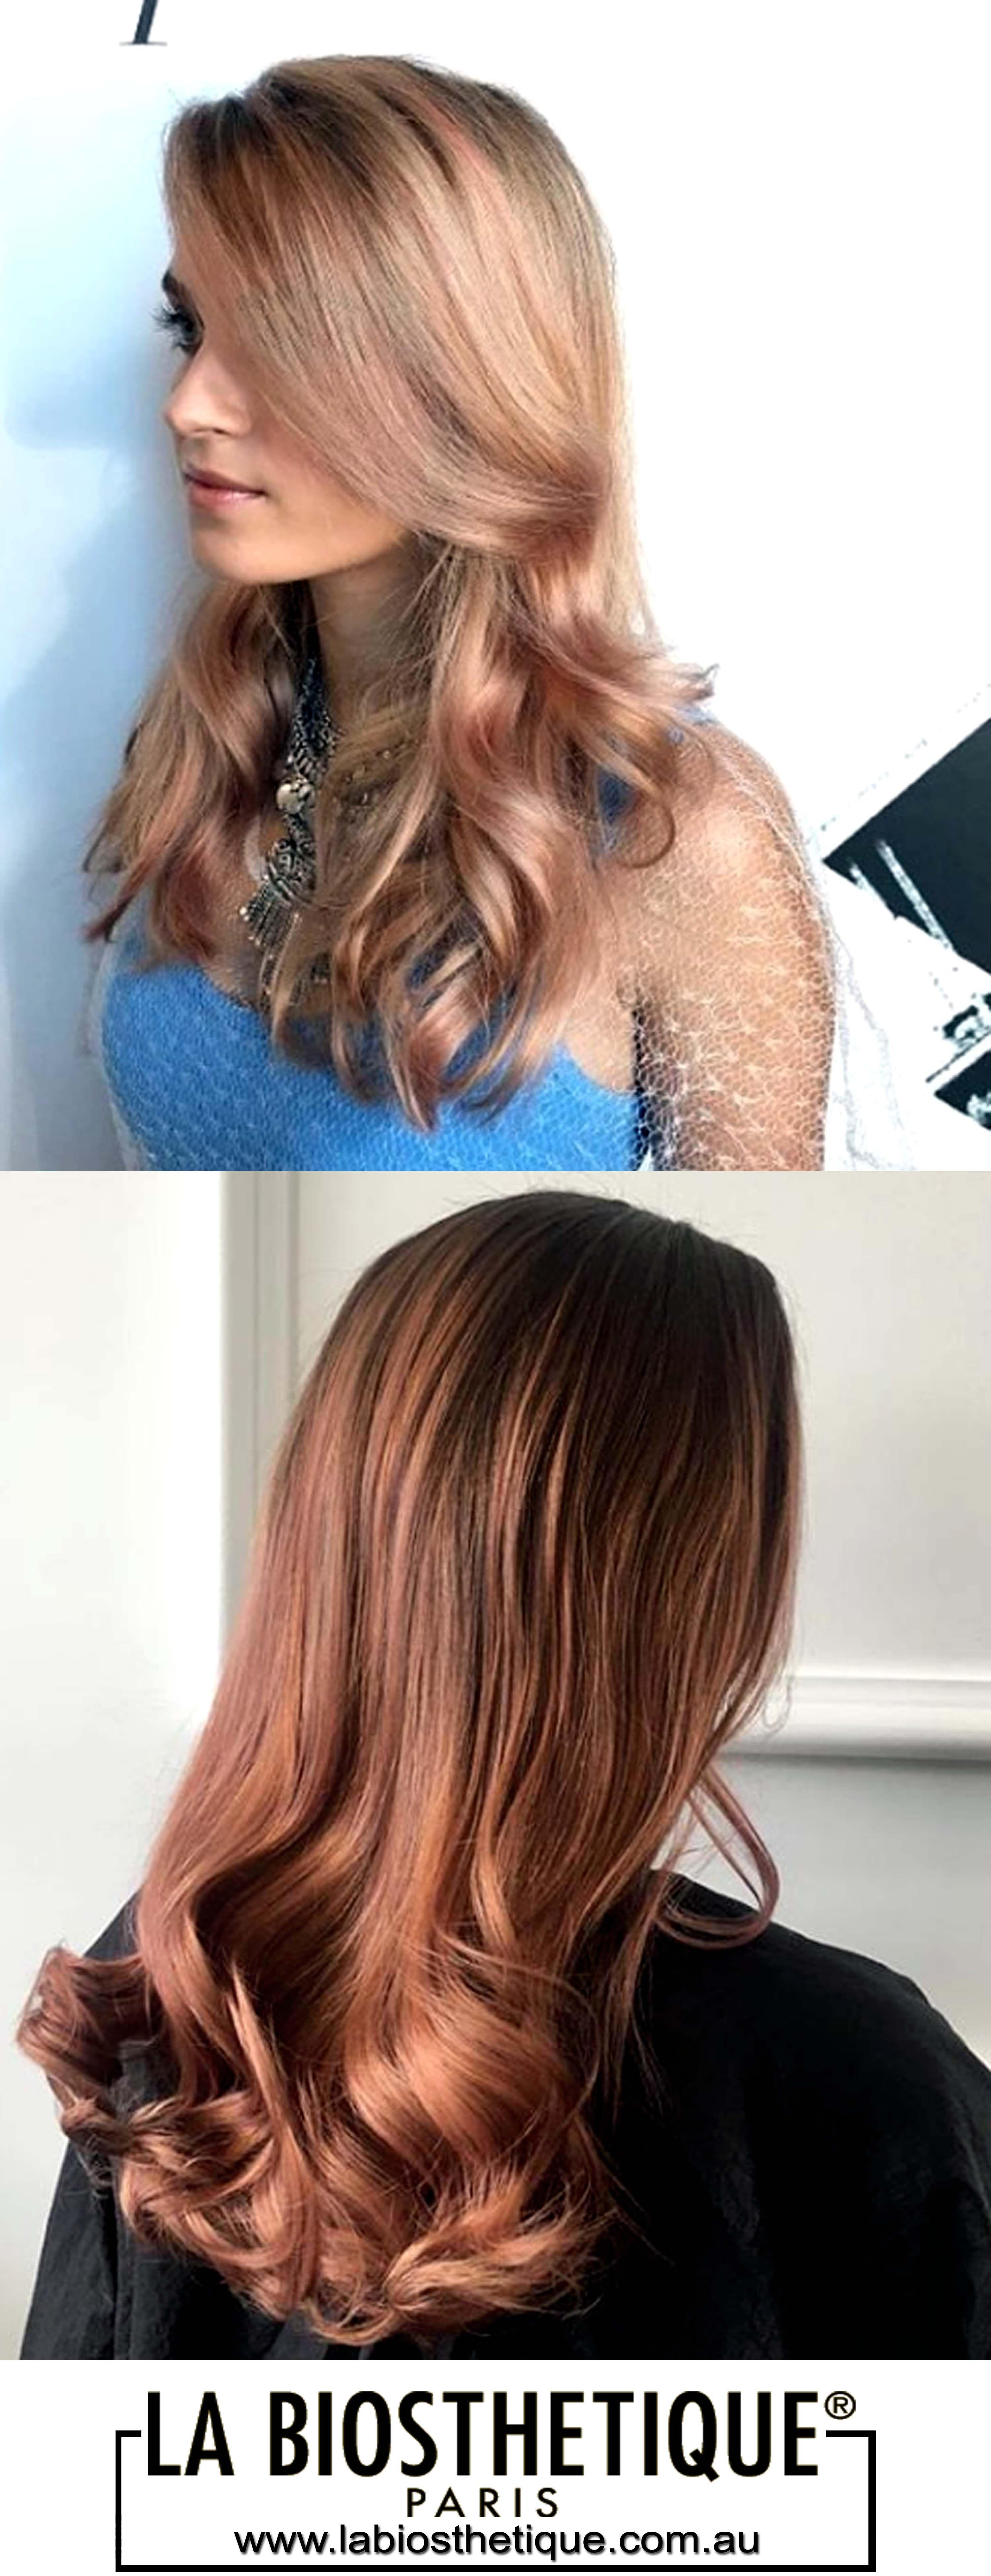 Beautiful hair hair styles short hairstyles cute girls